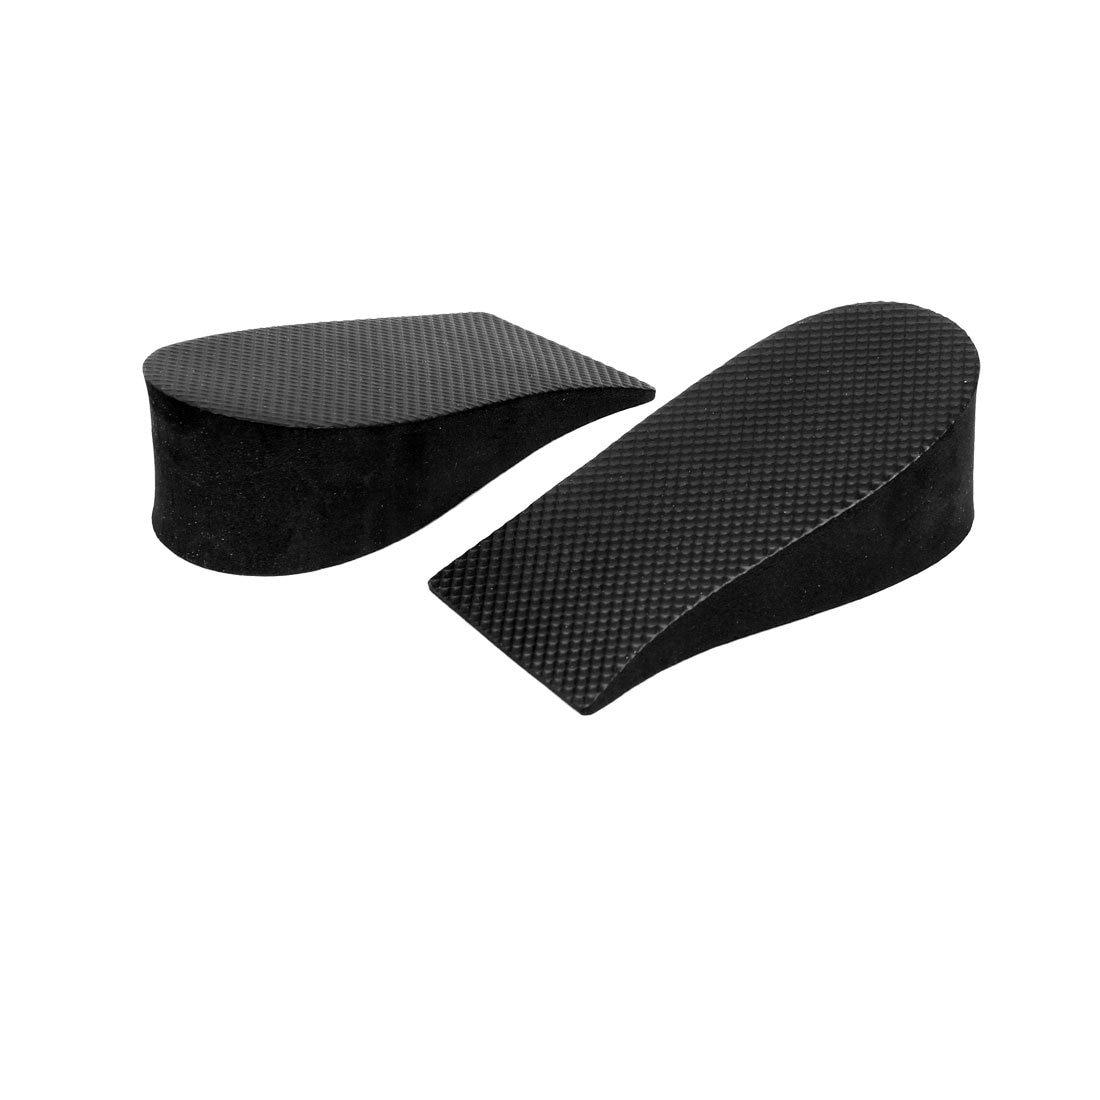 TEXU 2 Pcs 3.5cm Height Increase Heel Lifts Foam Pads Insoles Black